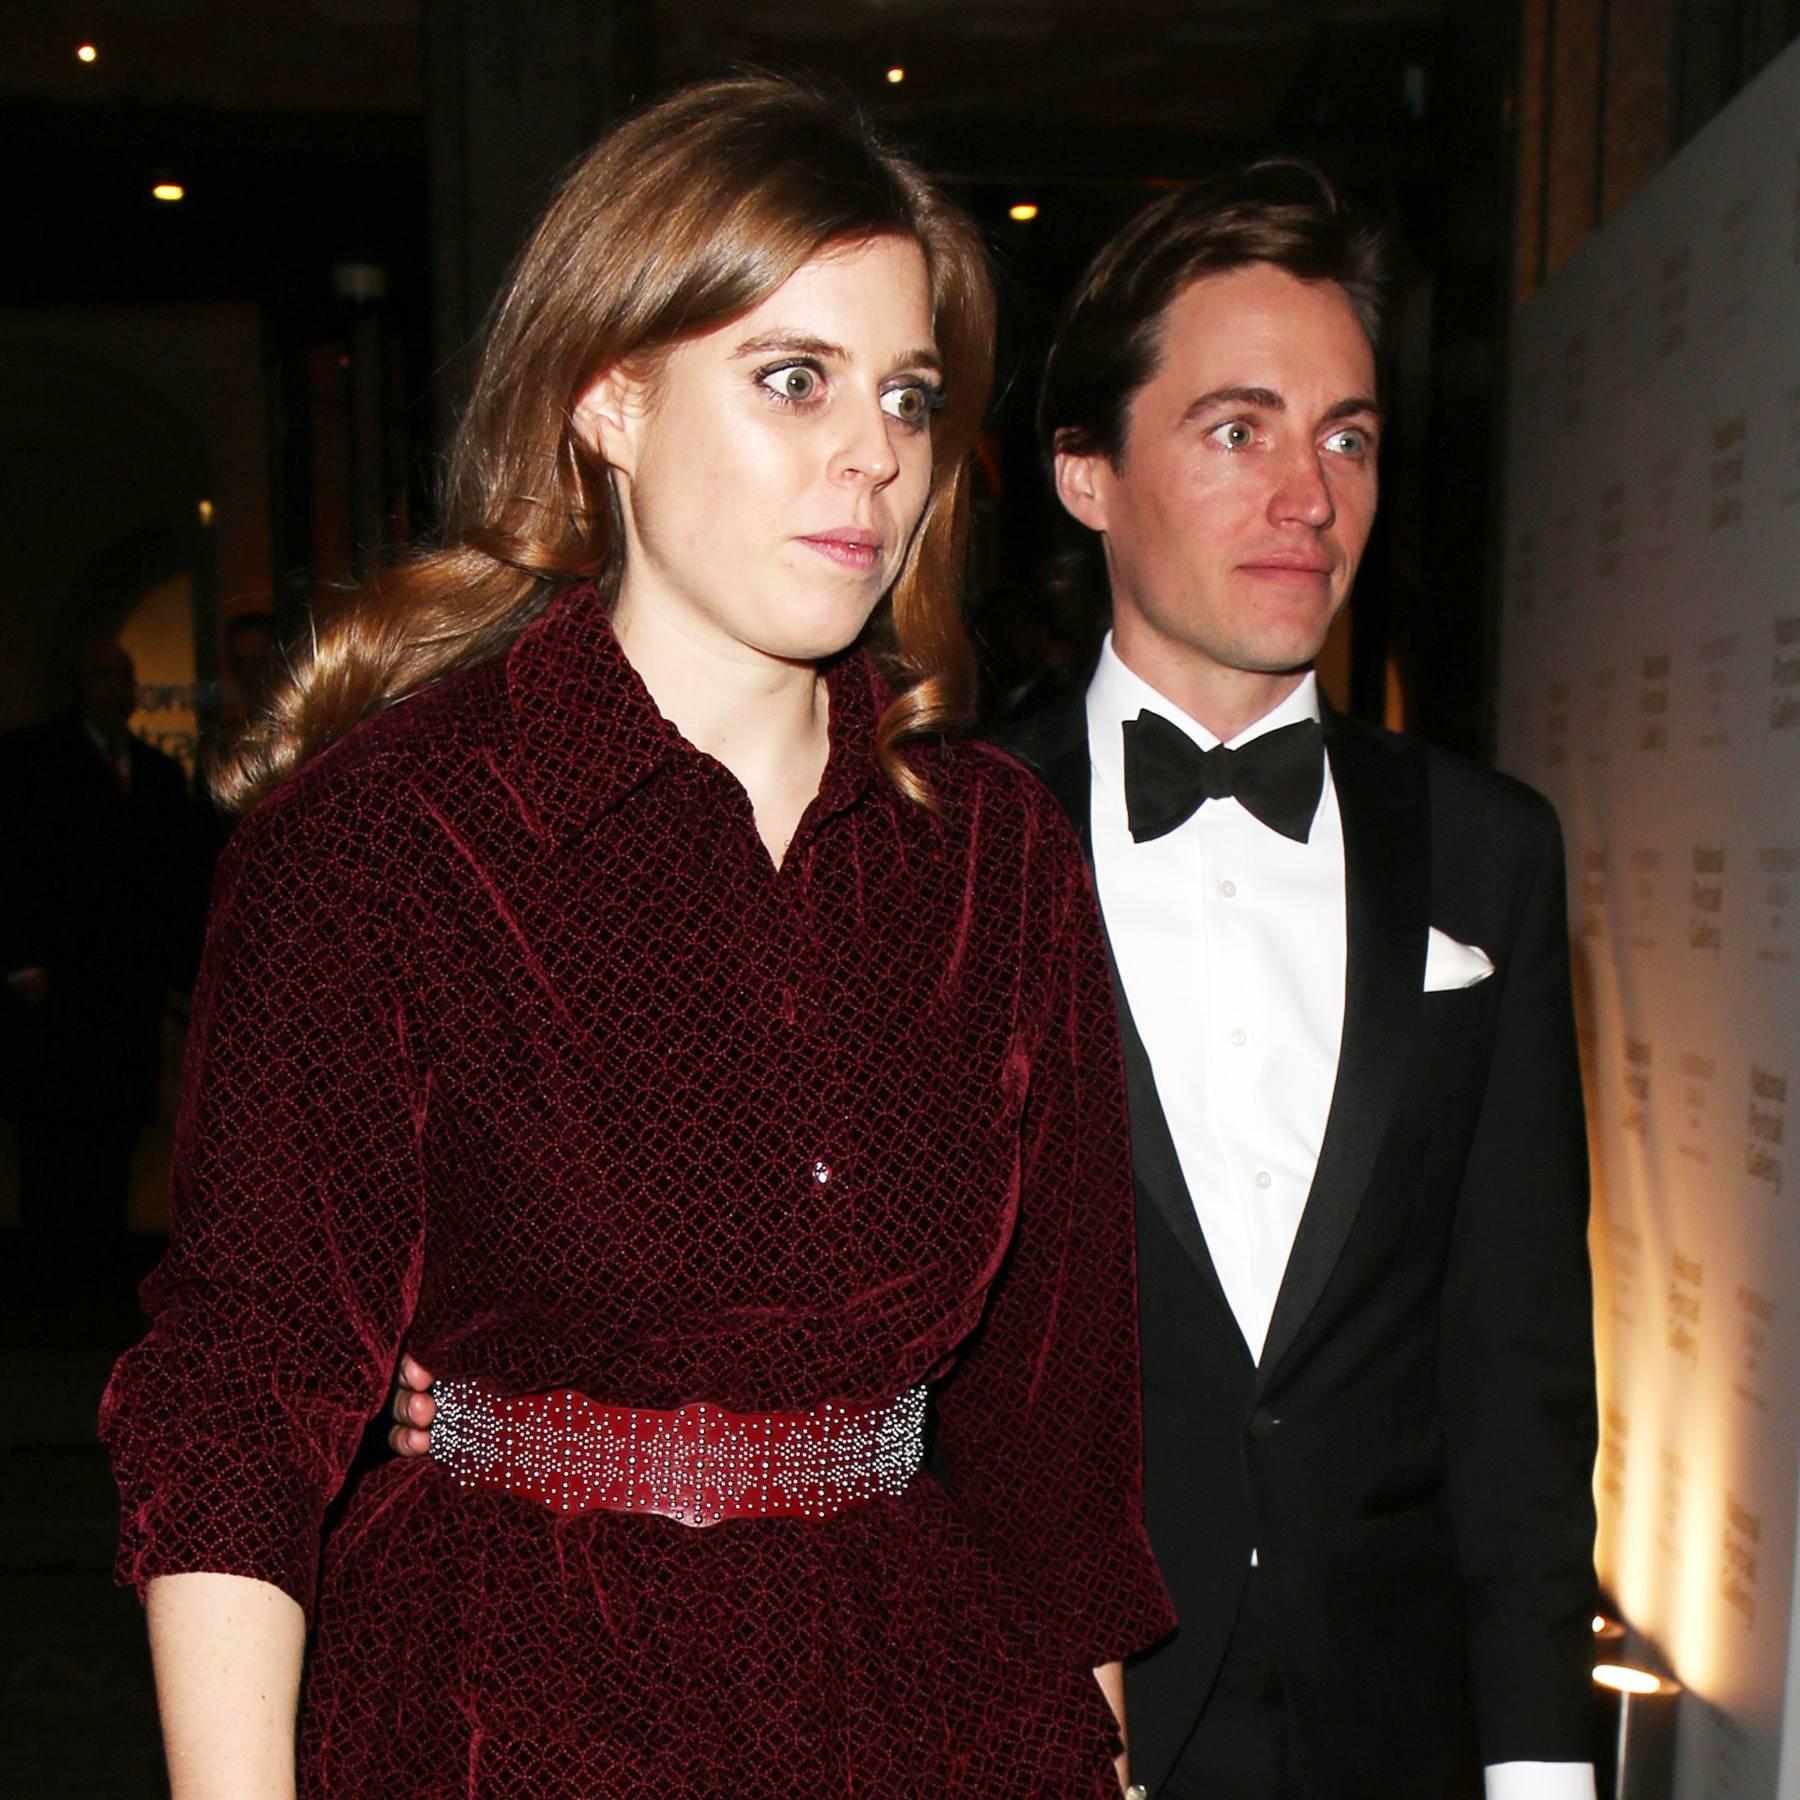 Concern rises among Princess Beatrice's friends